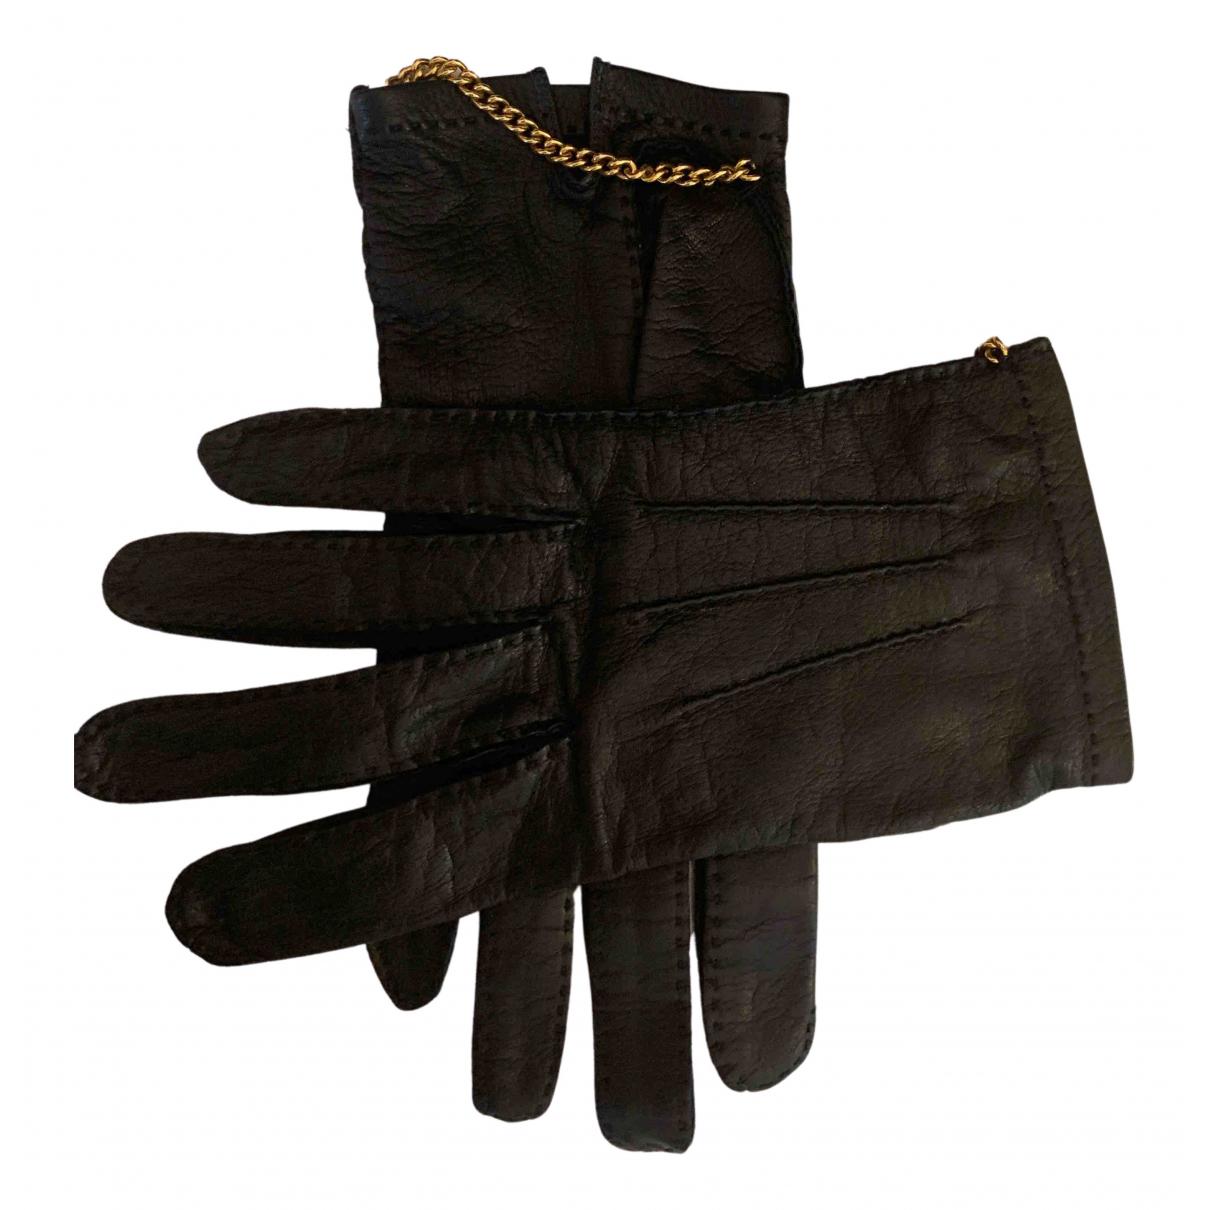 Chanel \N Handschuhe in  Blau Leder